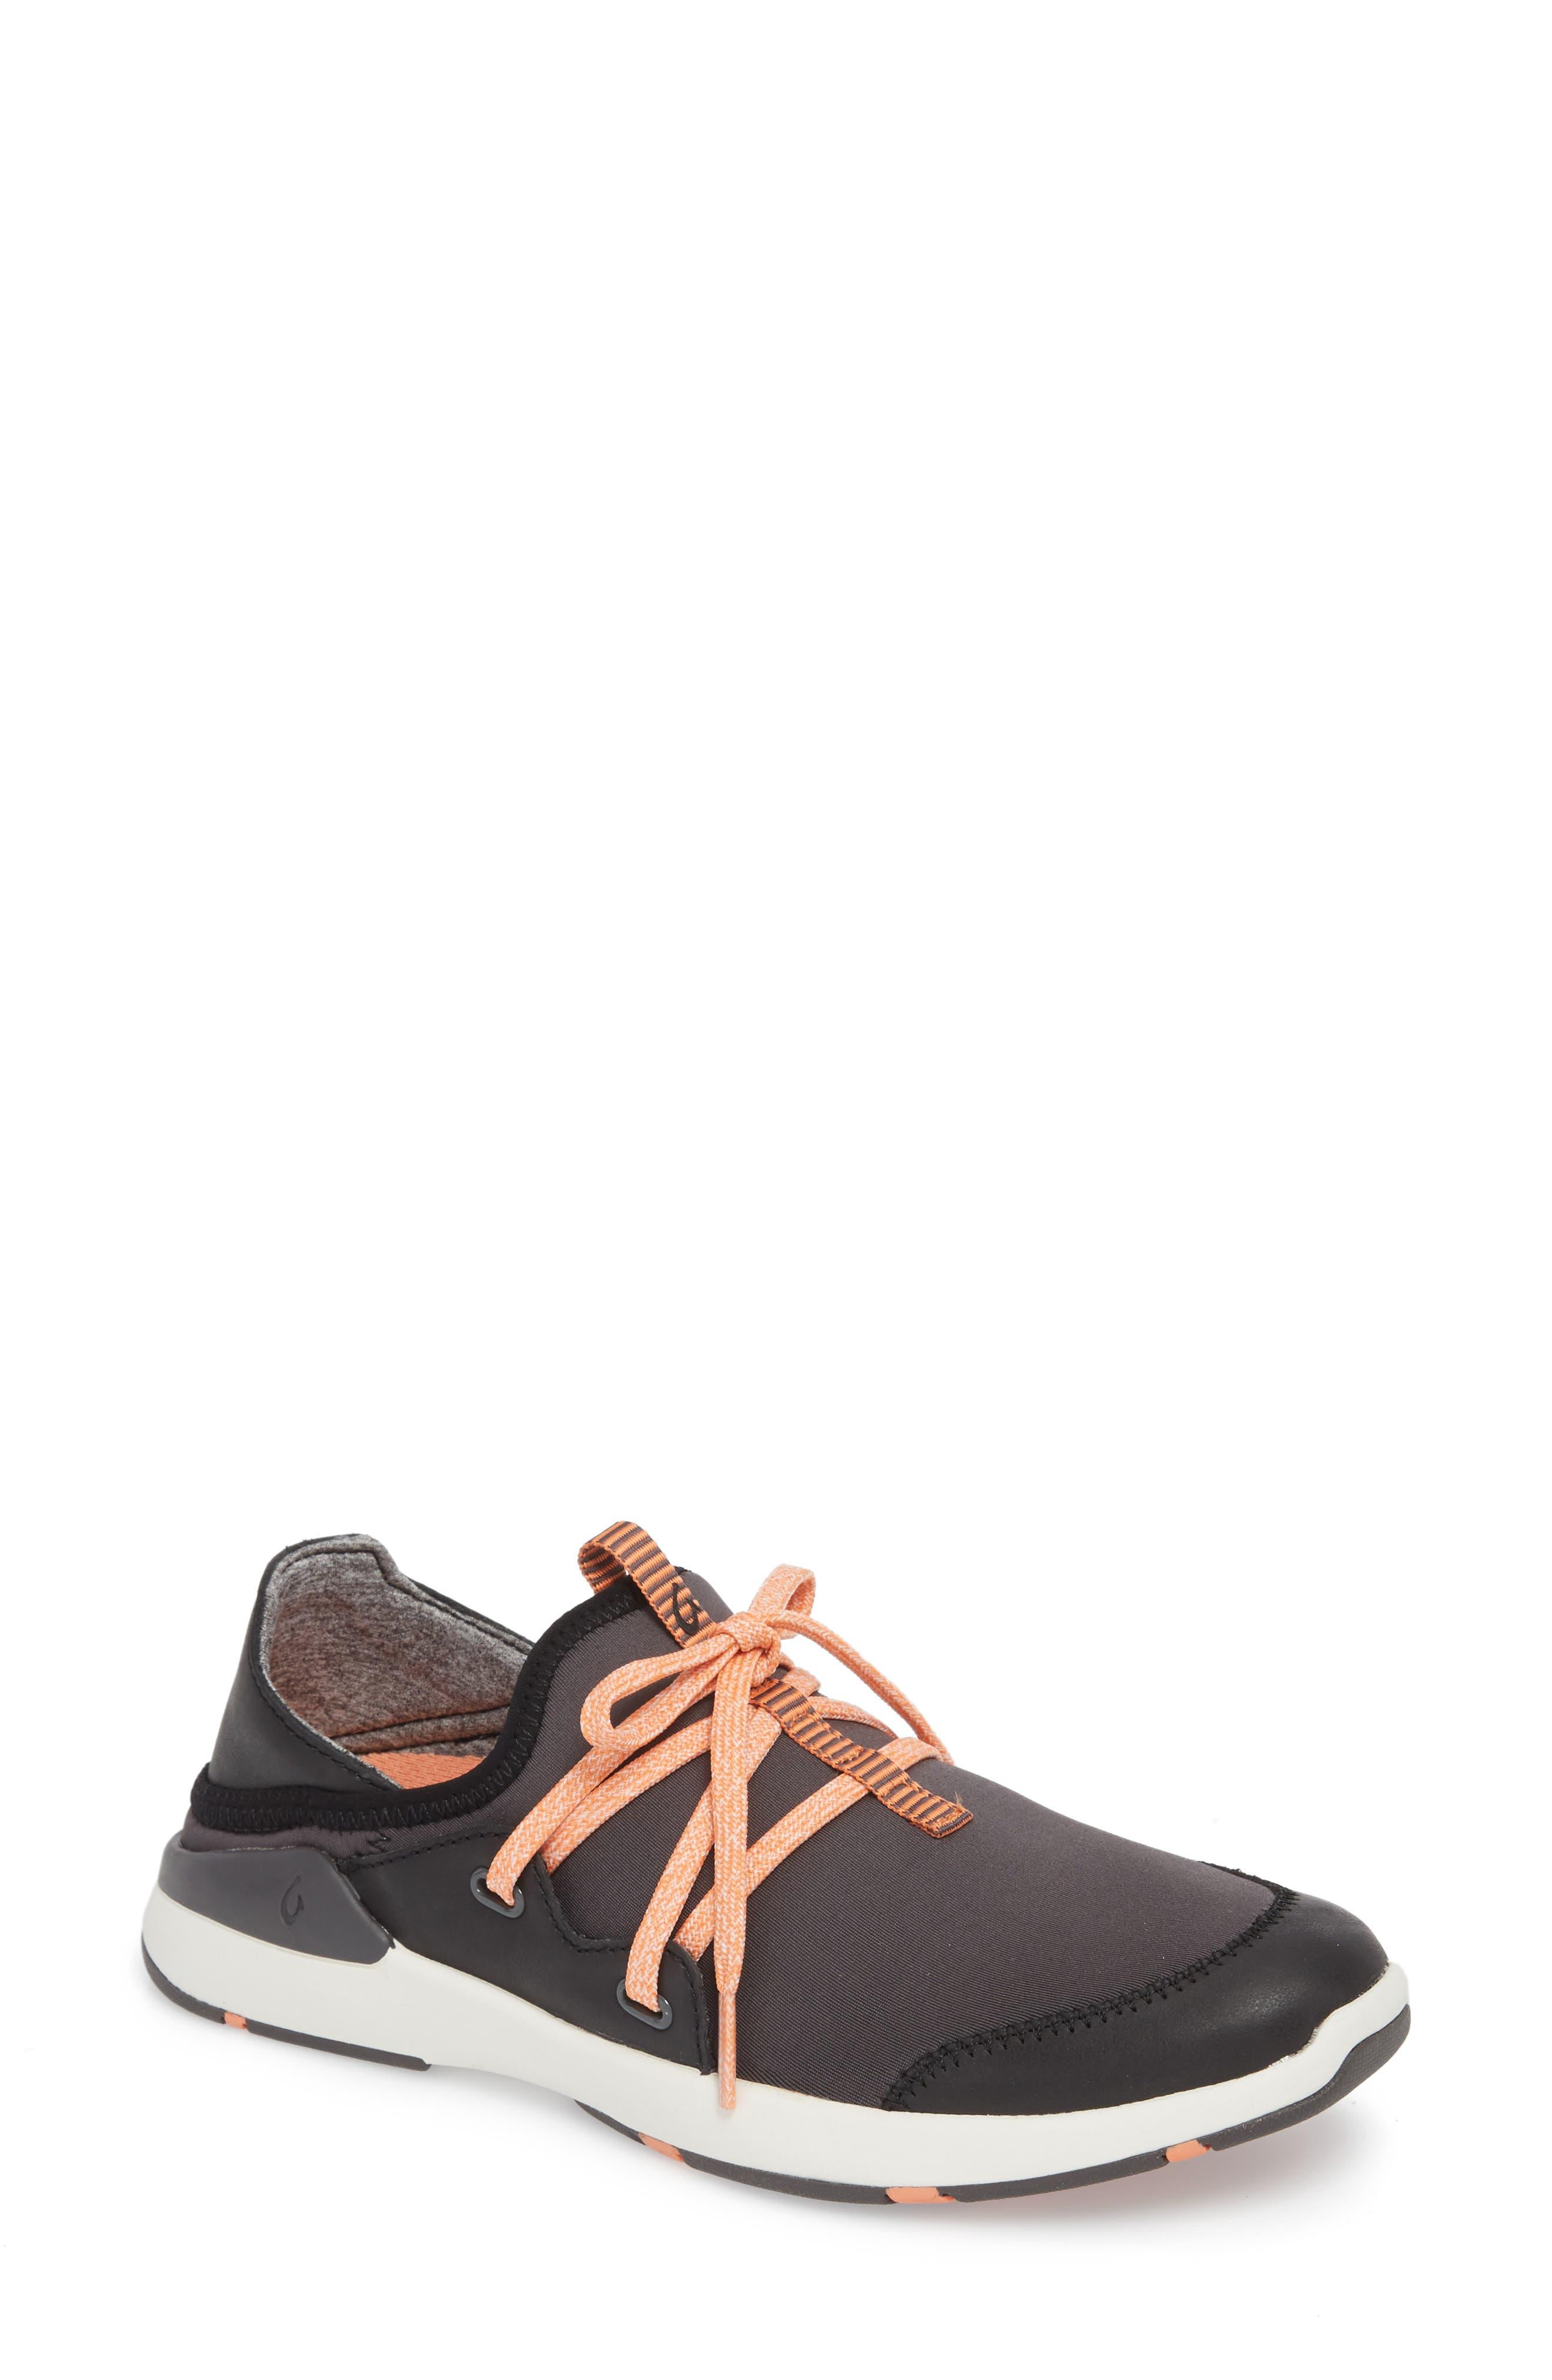 Miki Li Convertible Sneaker,                         Main,                         color, PAVEMENT/ BLACK FABRIC